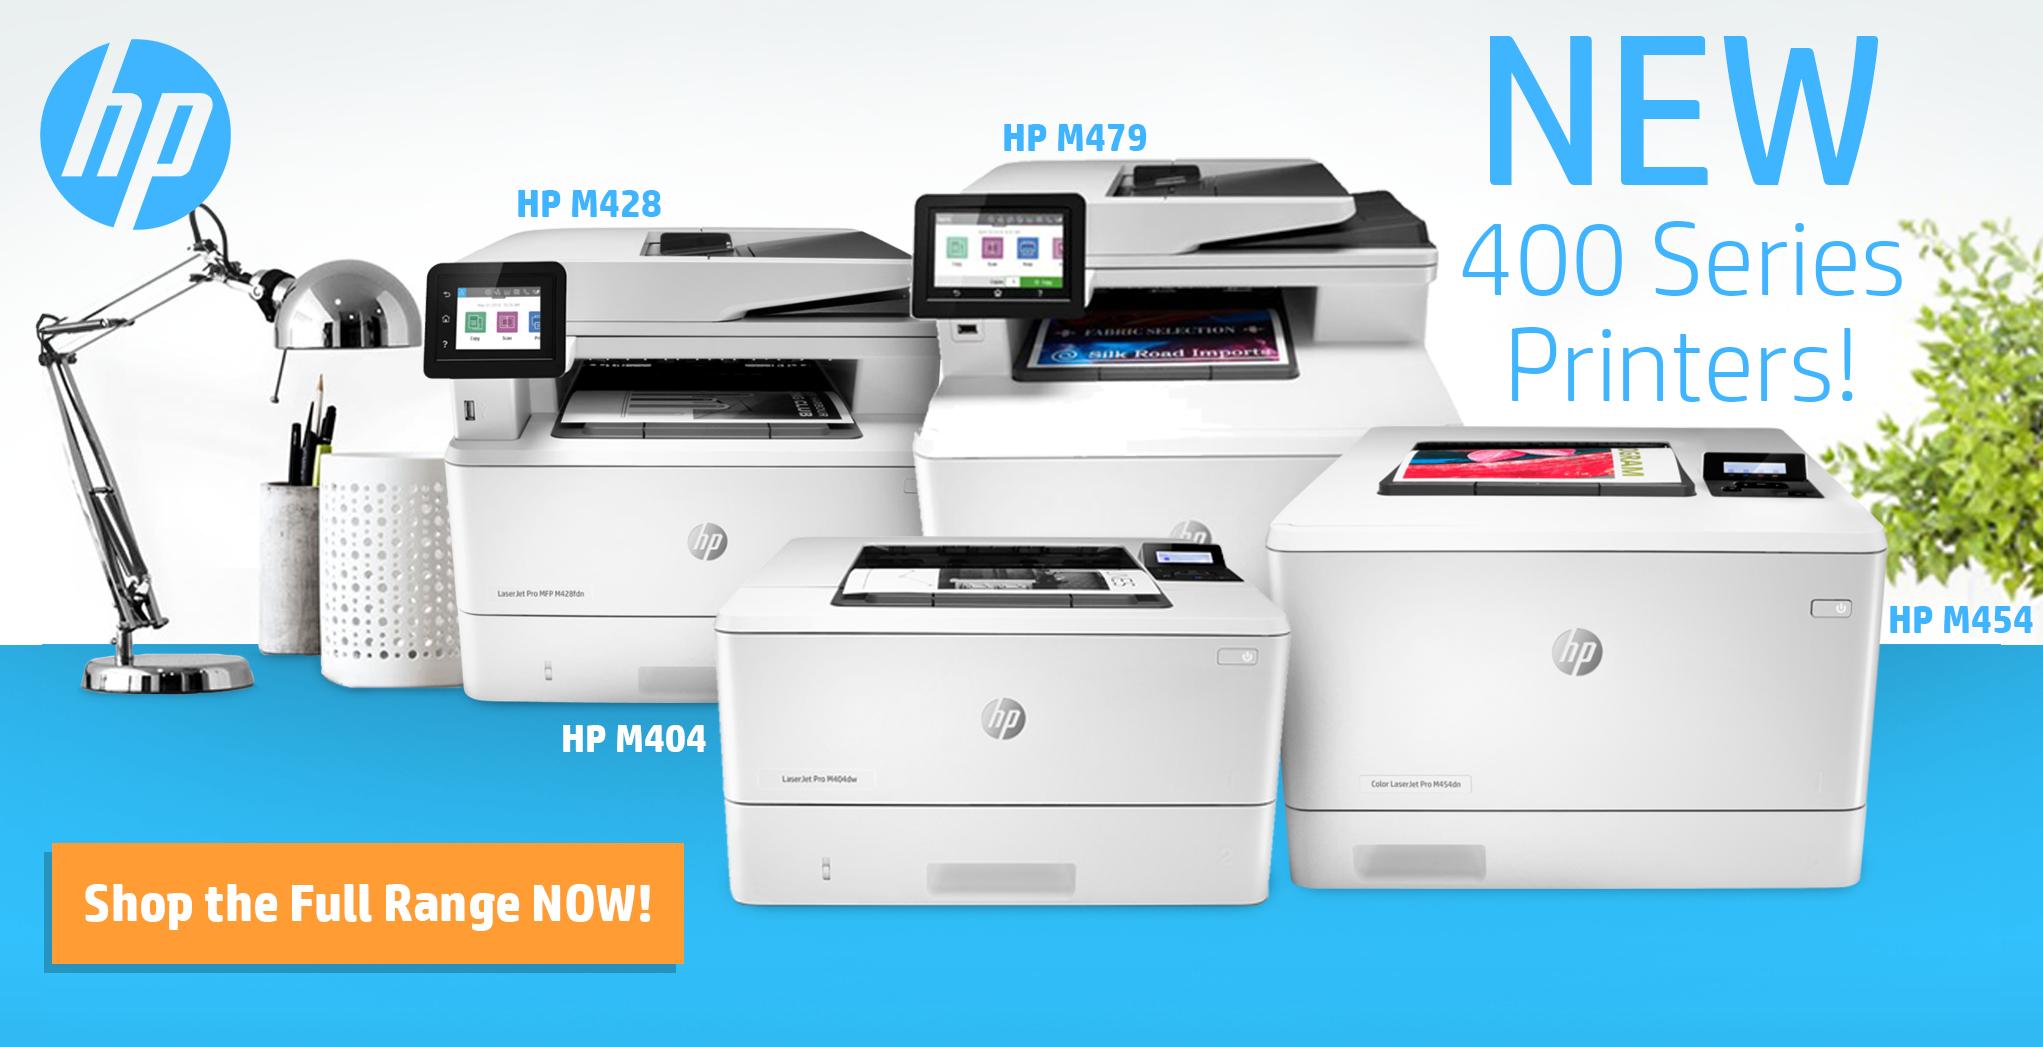 New HP 400 Series Printers